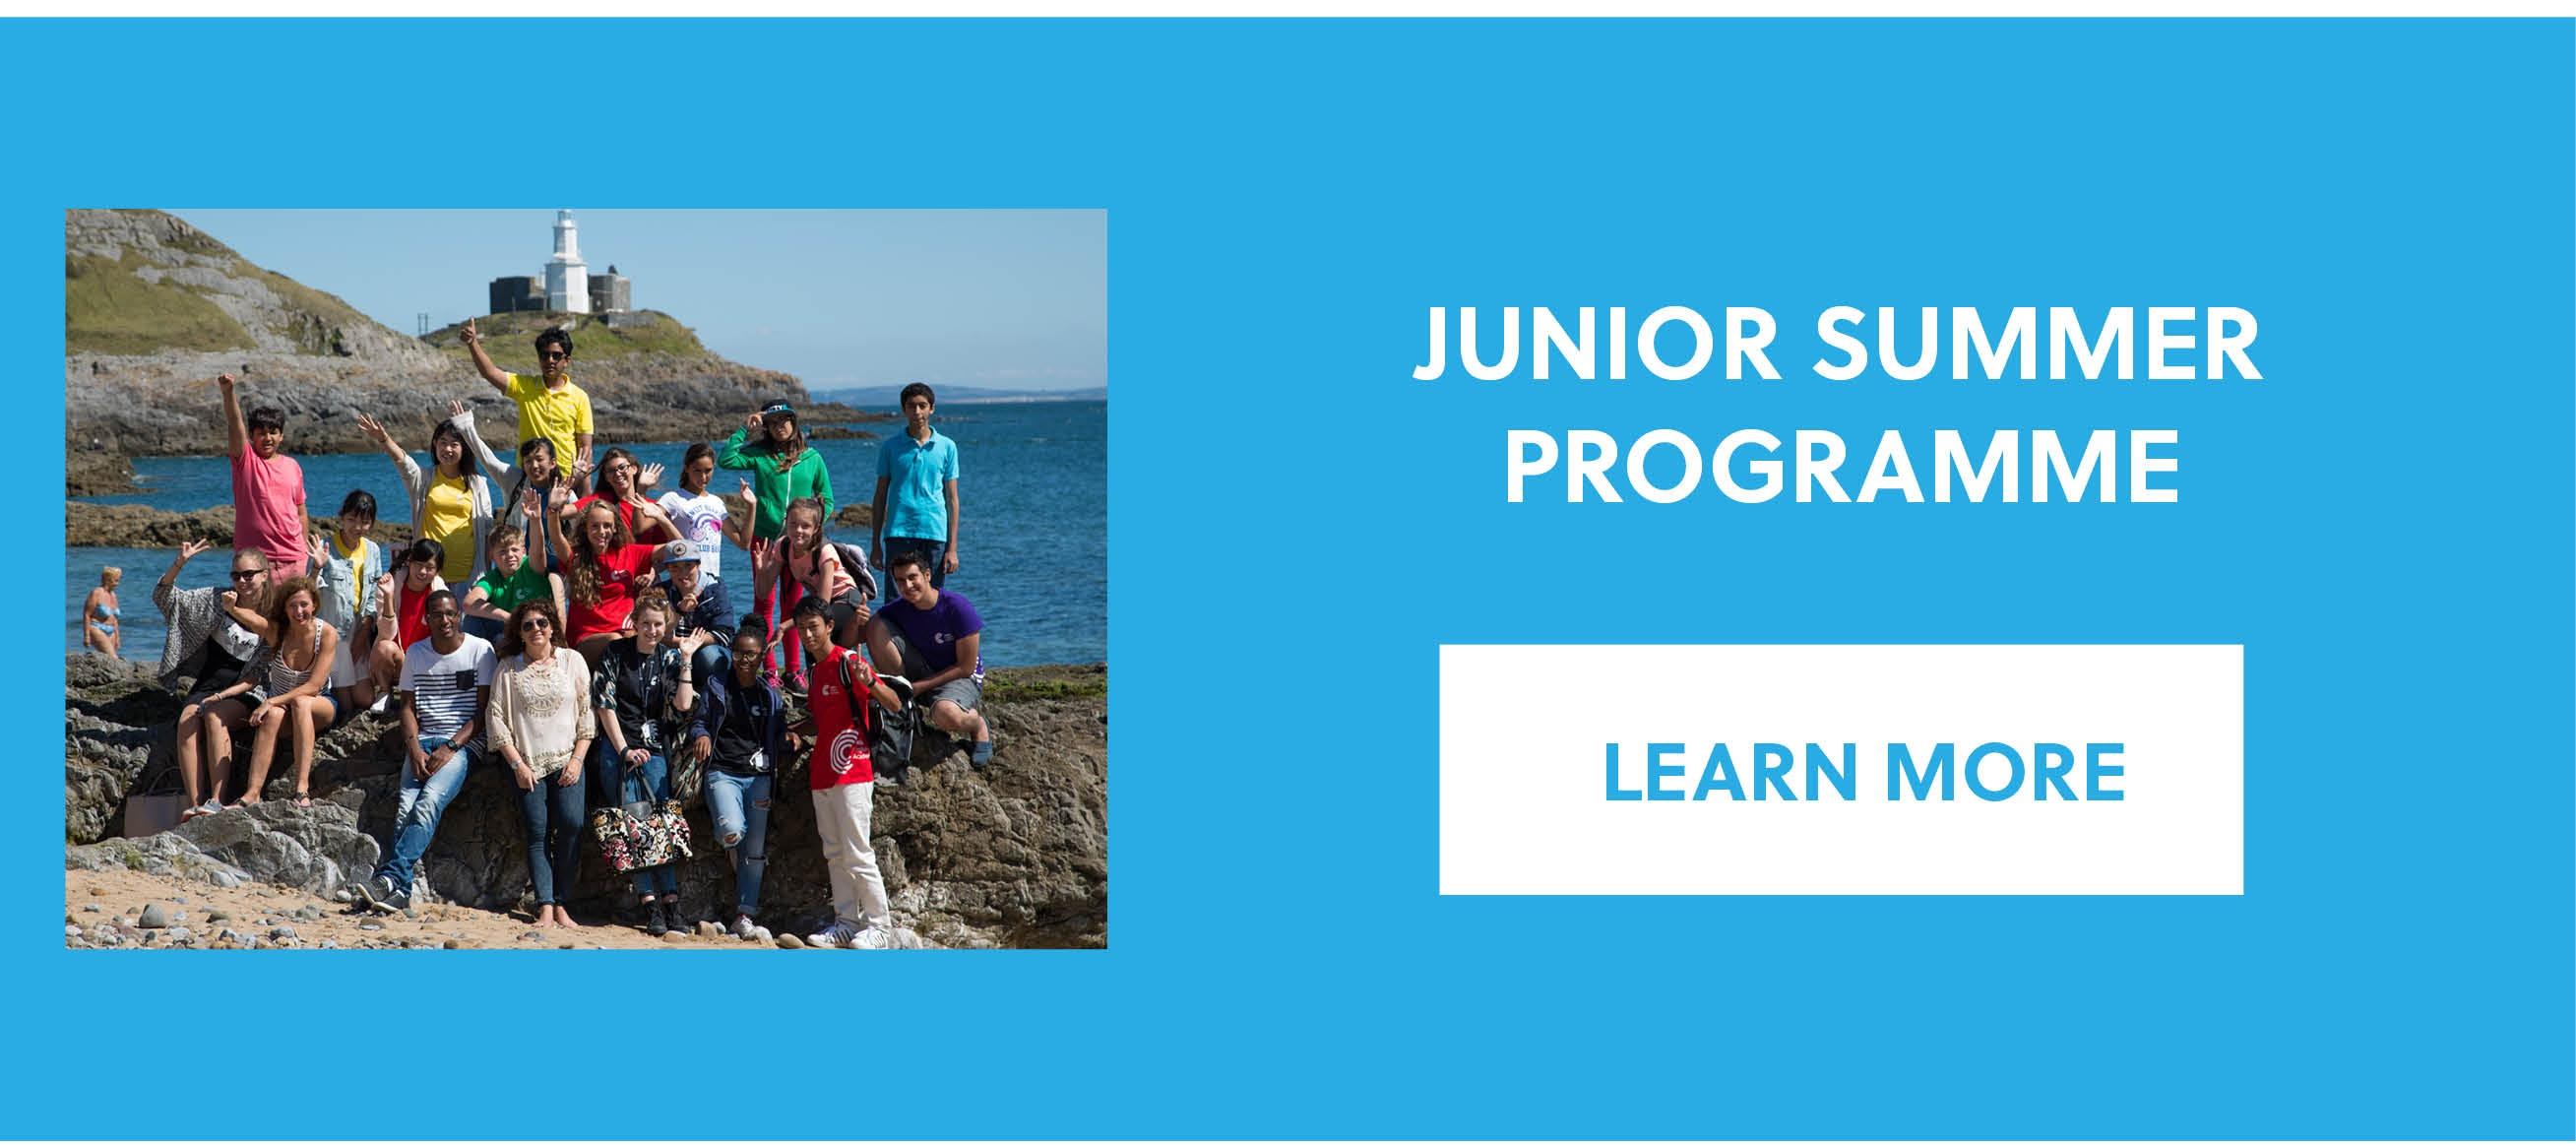 Junior Summer Programme in Colwyn Bay, Celtic English Academy